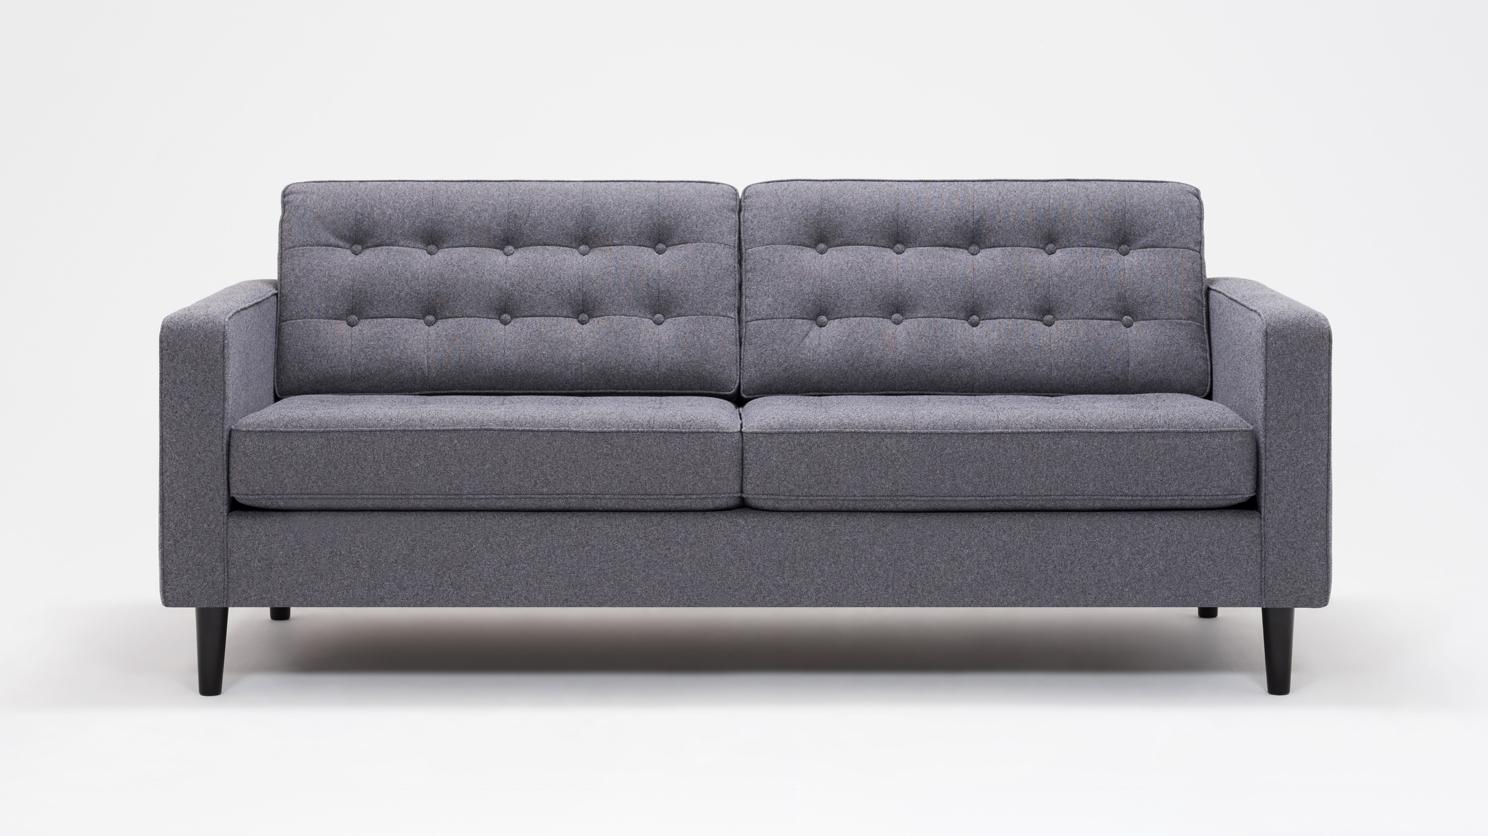 Eq3 | Reverie Apartment Sofa   Fabric Within Apartment Sofas (Photo 7 of 10)